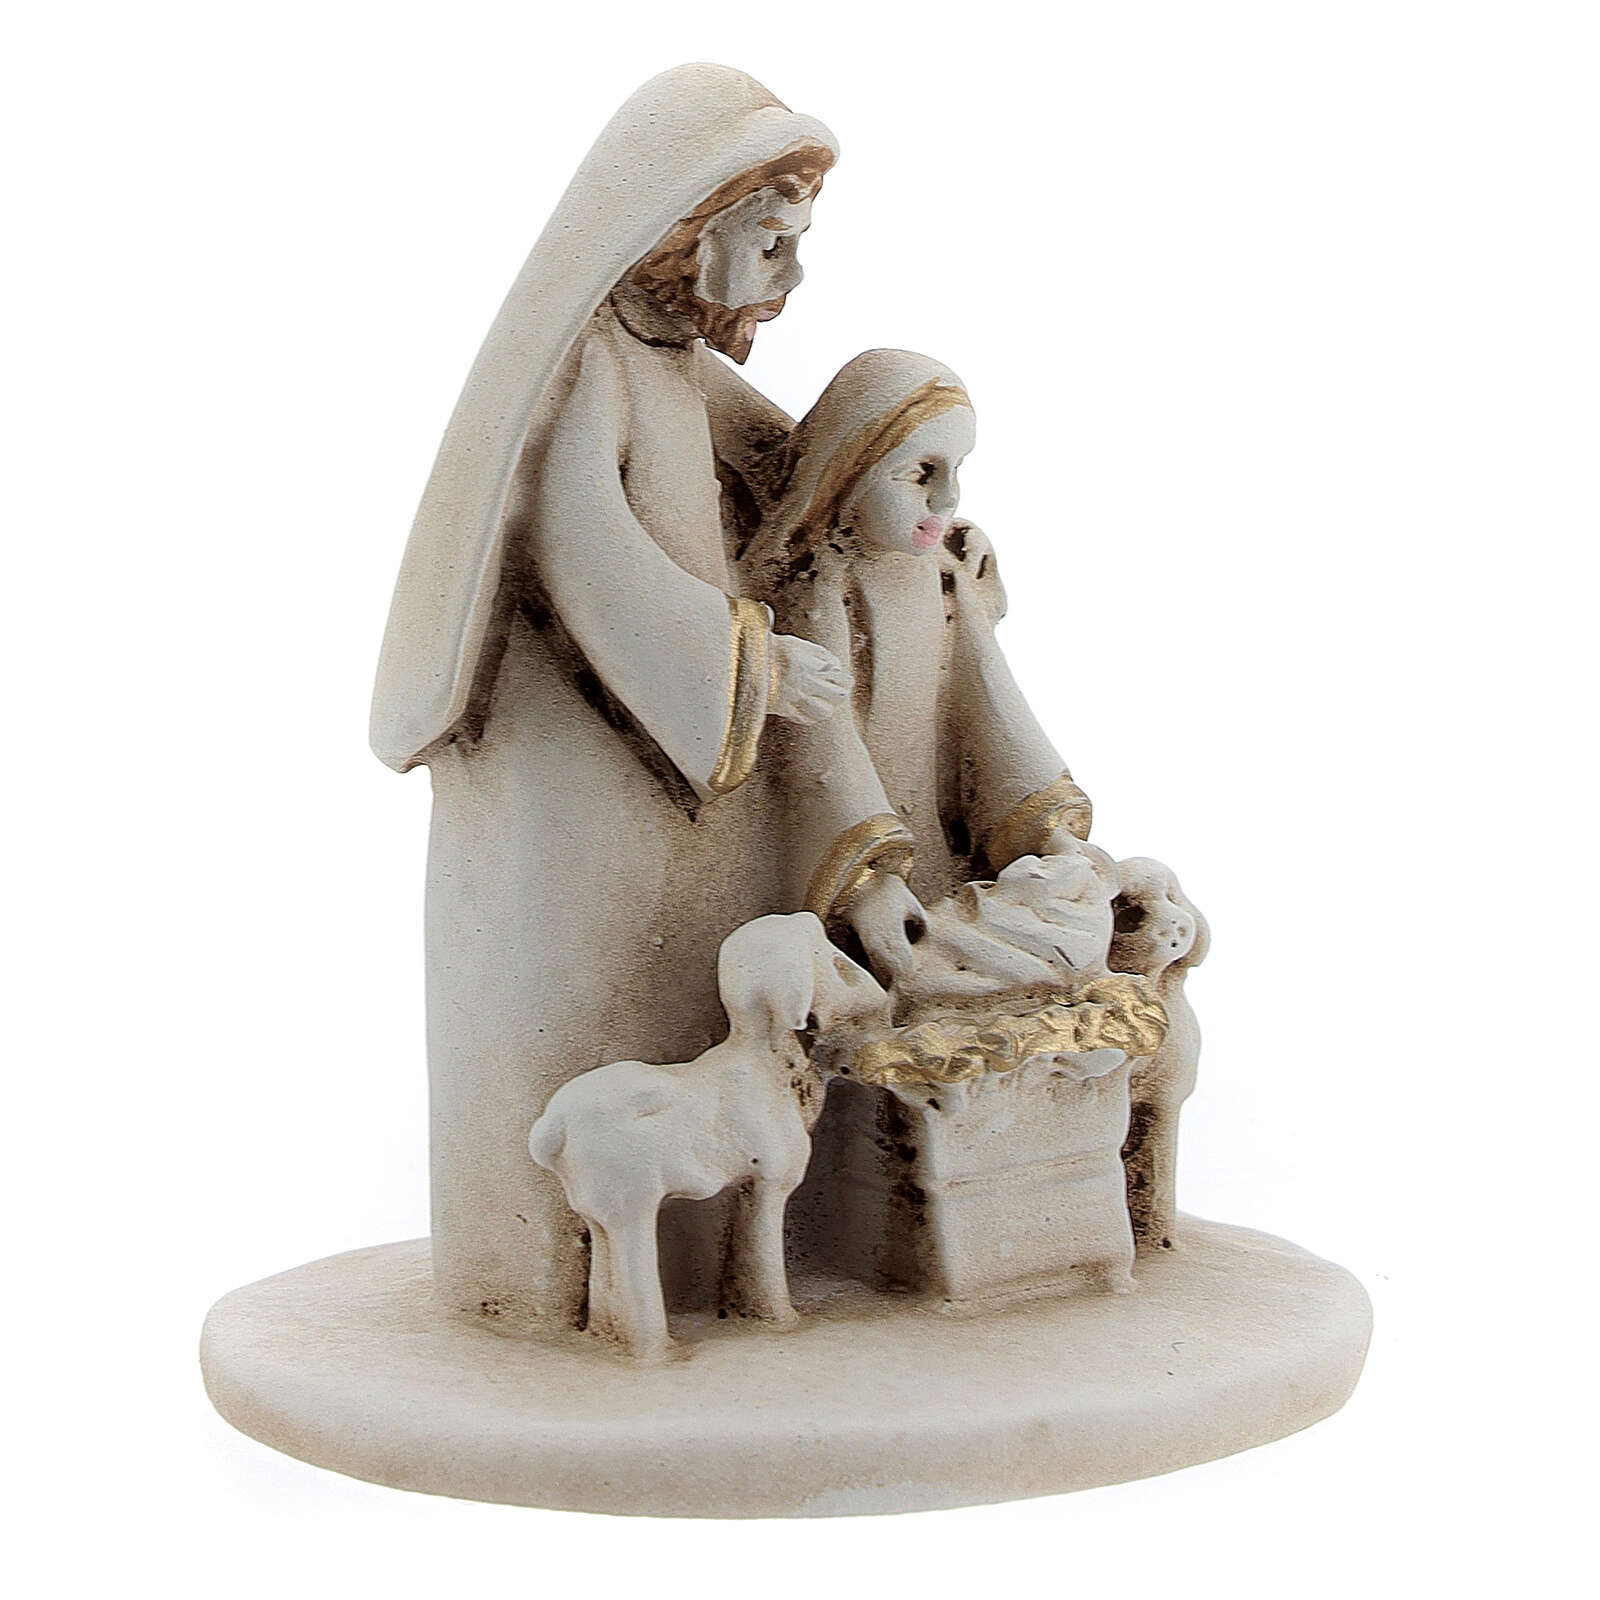 Natividad con ovejas estilo árabe resina 5 cm 3